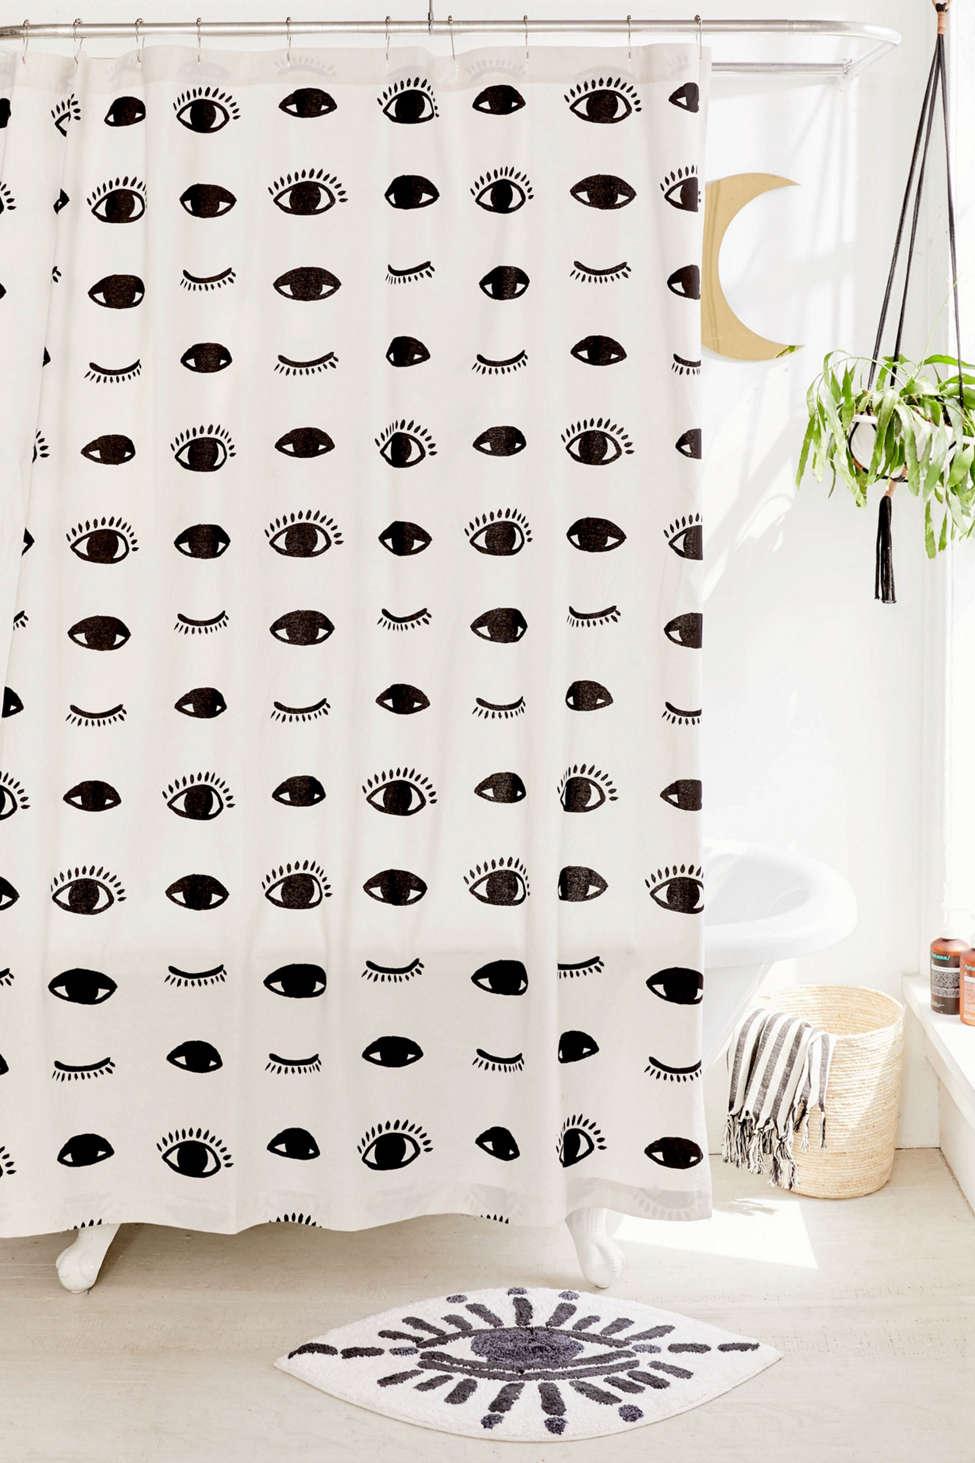 Slide View: 1: Winky Eyes Shower Curtain